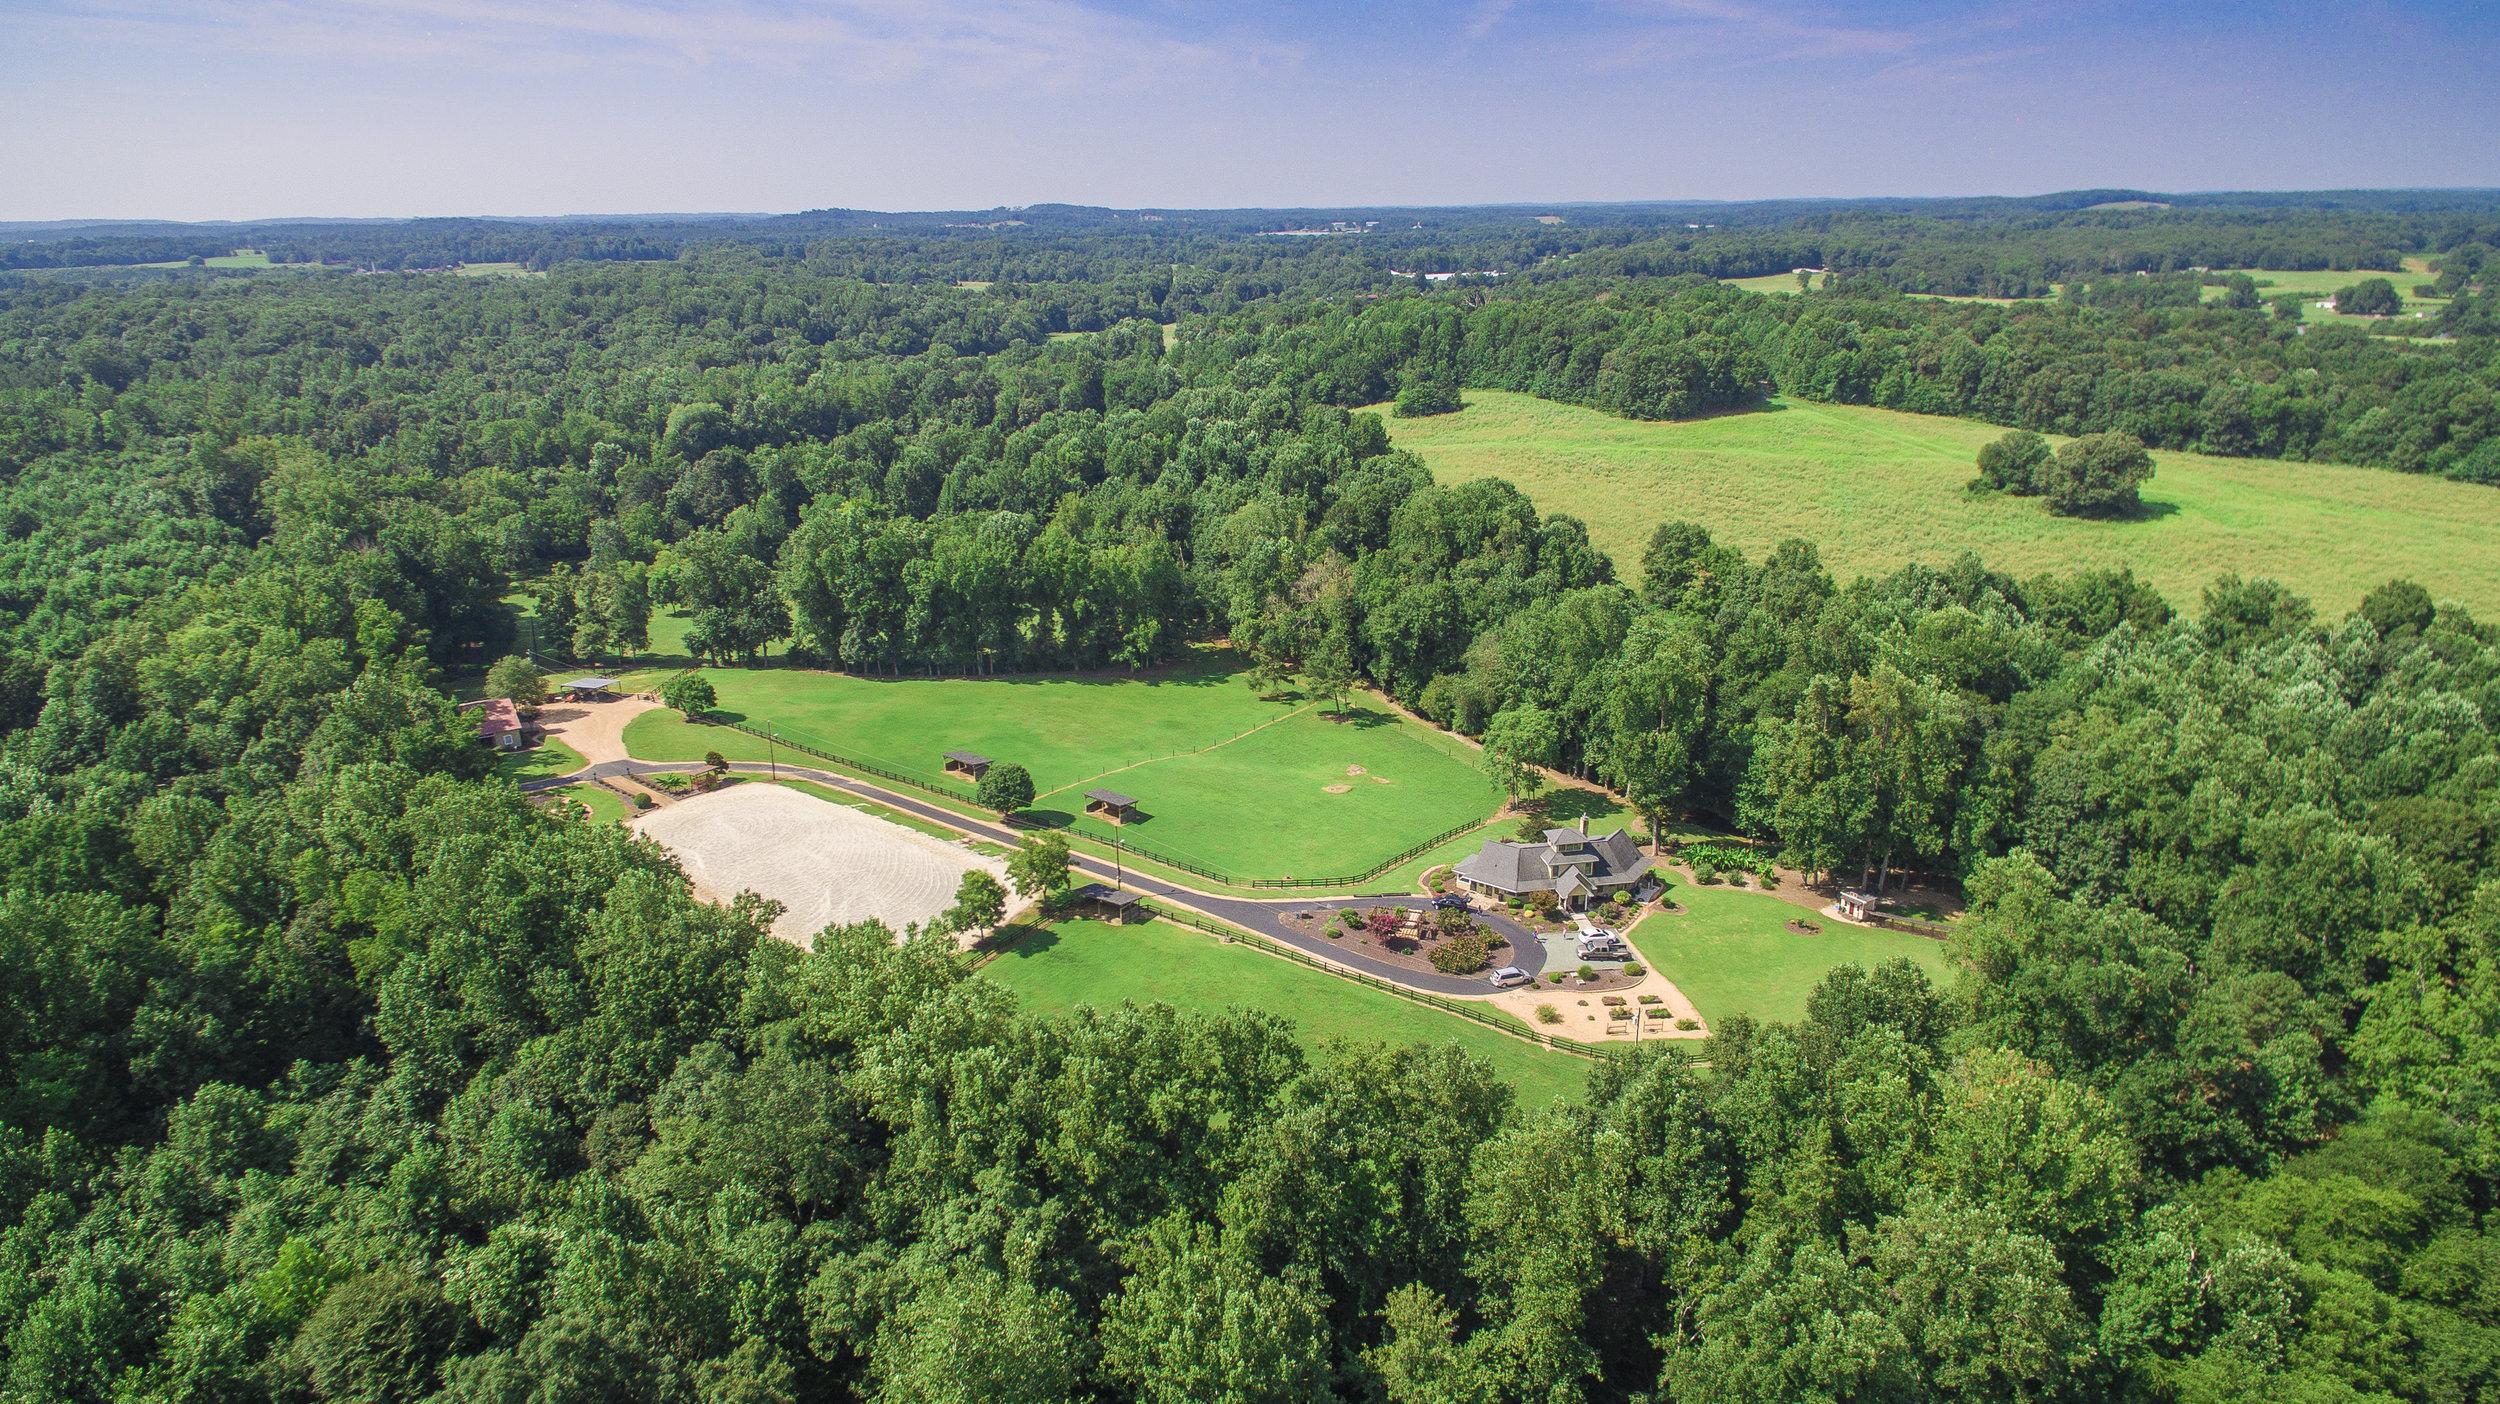 real-estate-photography-drone-photographer-drone-greensboro-nc-triad-210.jpg